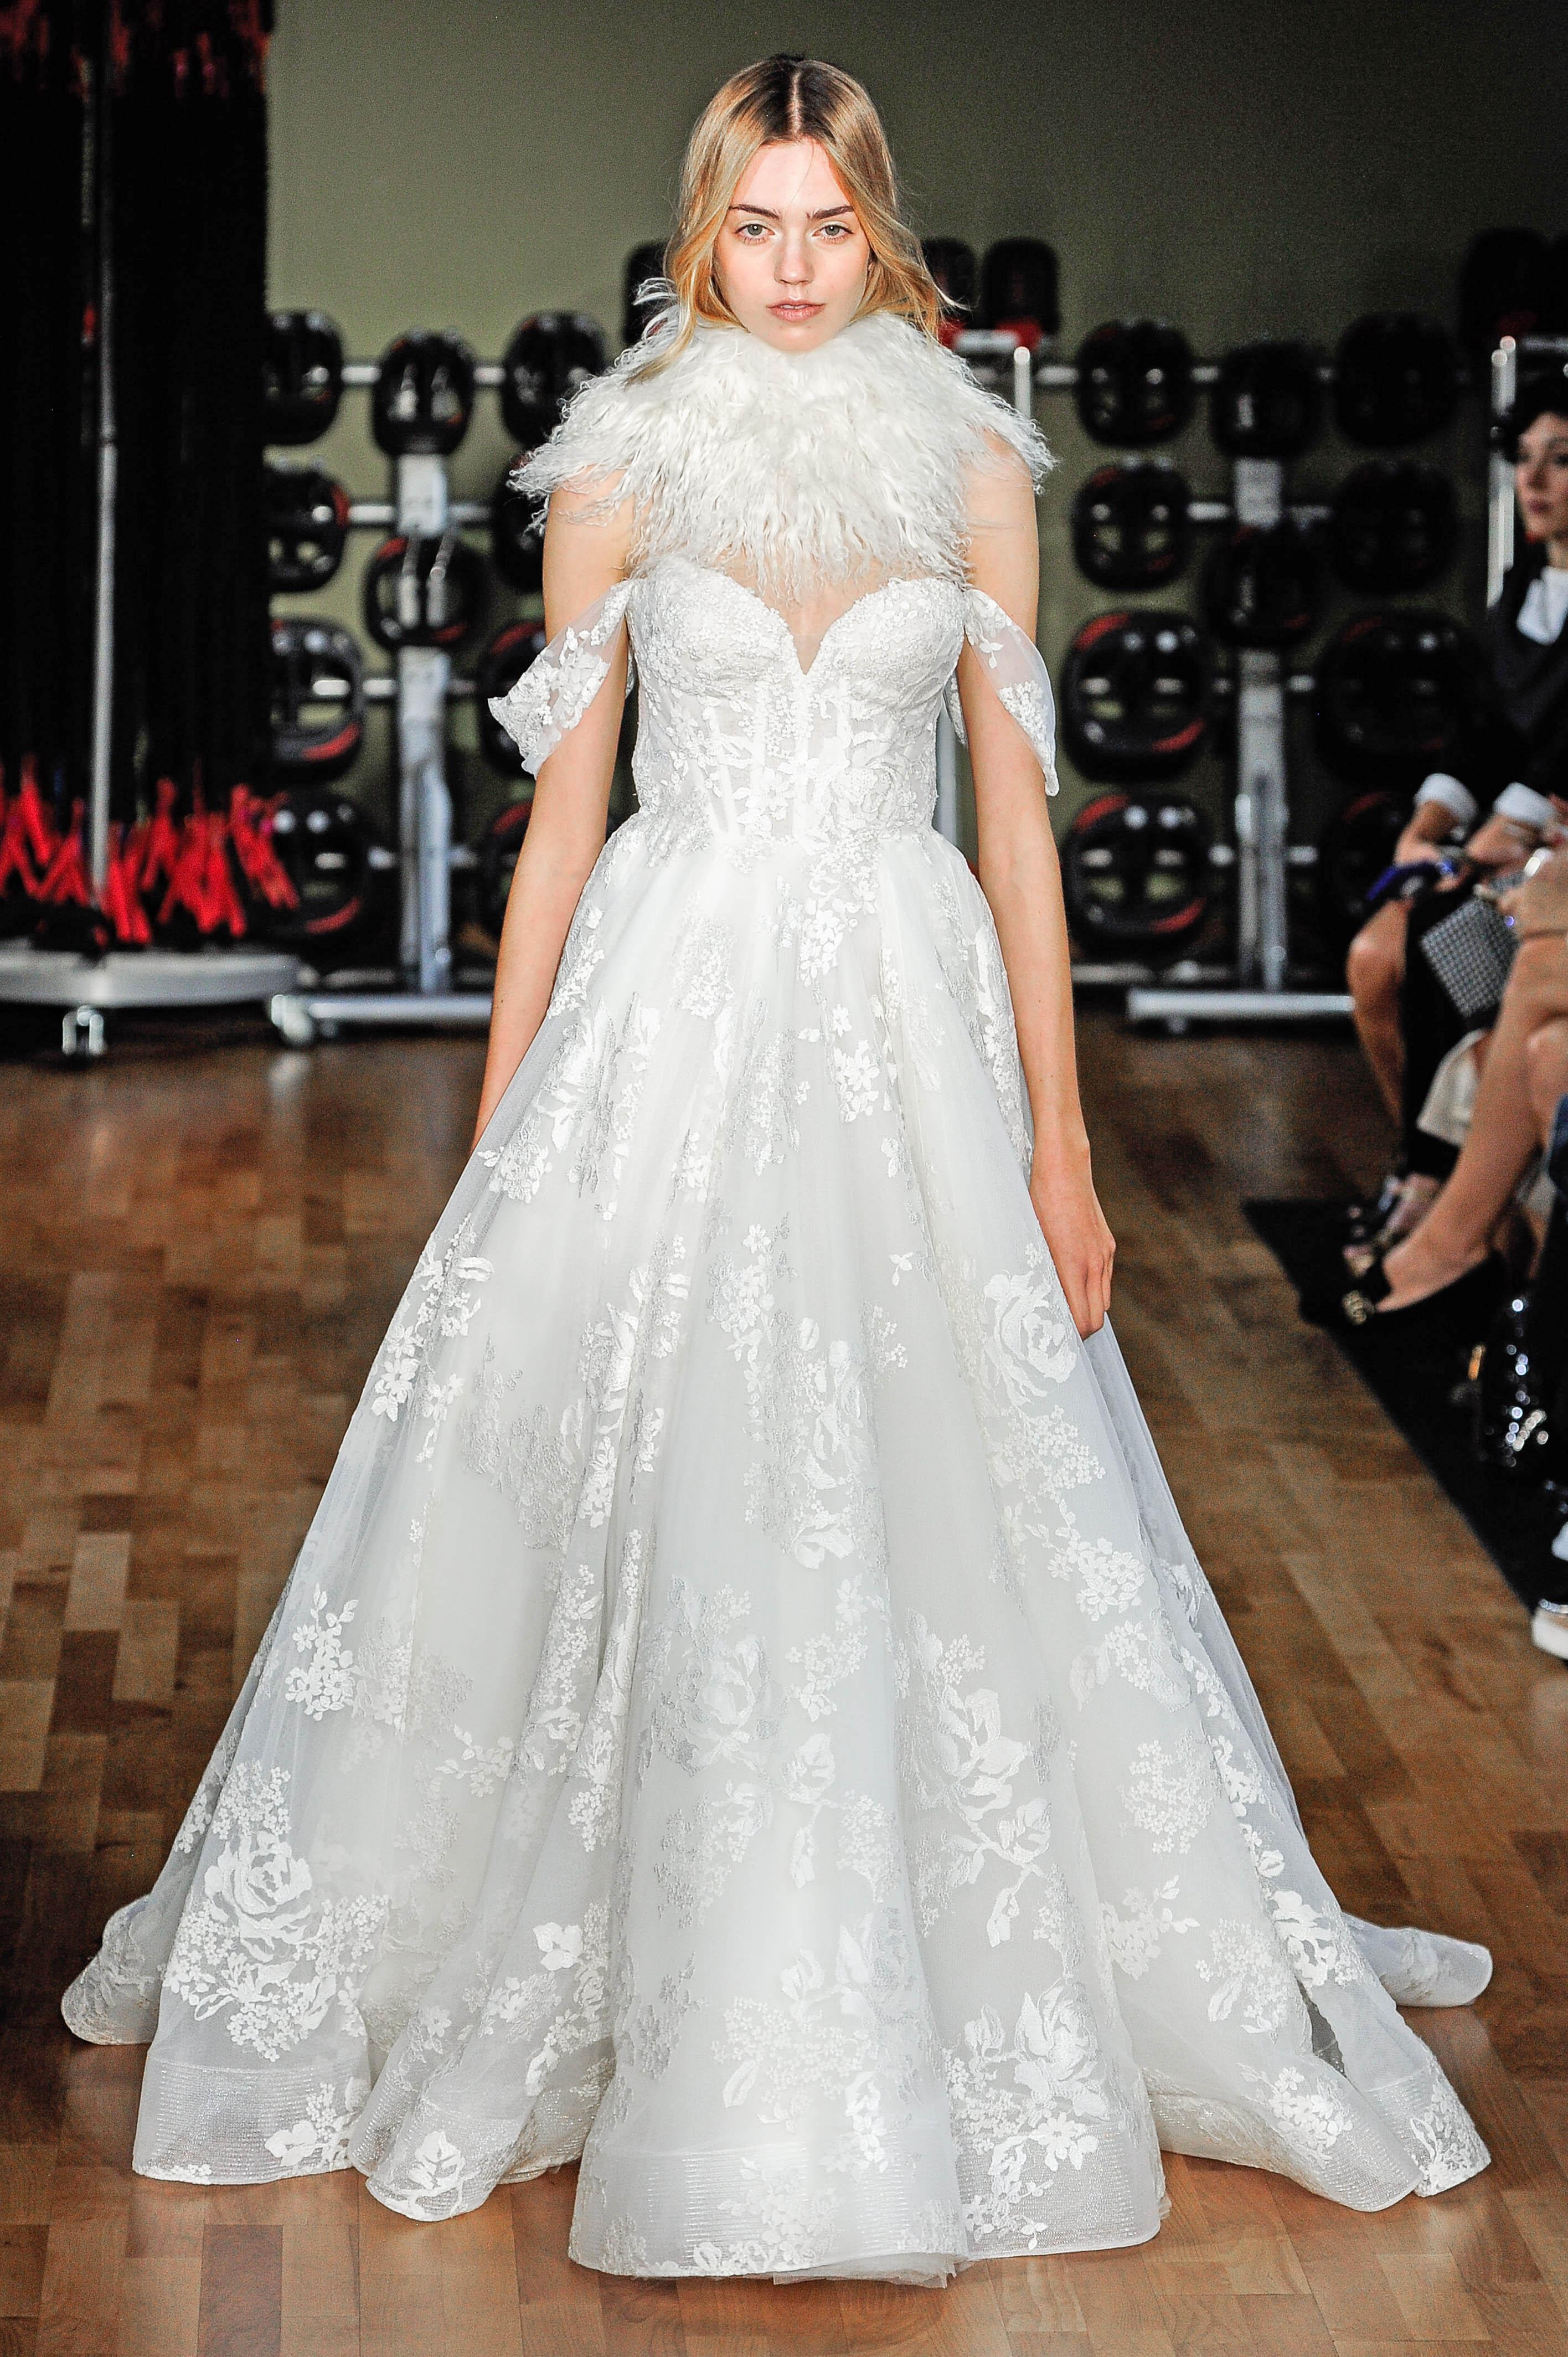 rivini by rita vinieris sweetheart neckline off the shoulder a-line wedding dress fall 2018